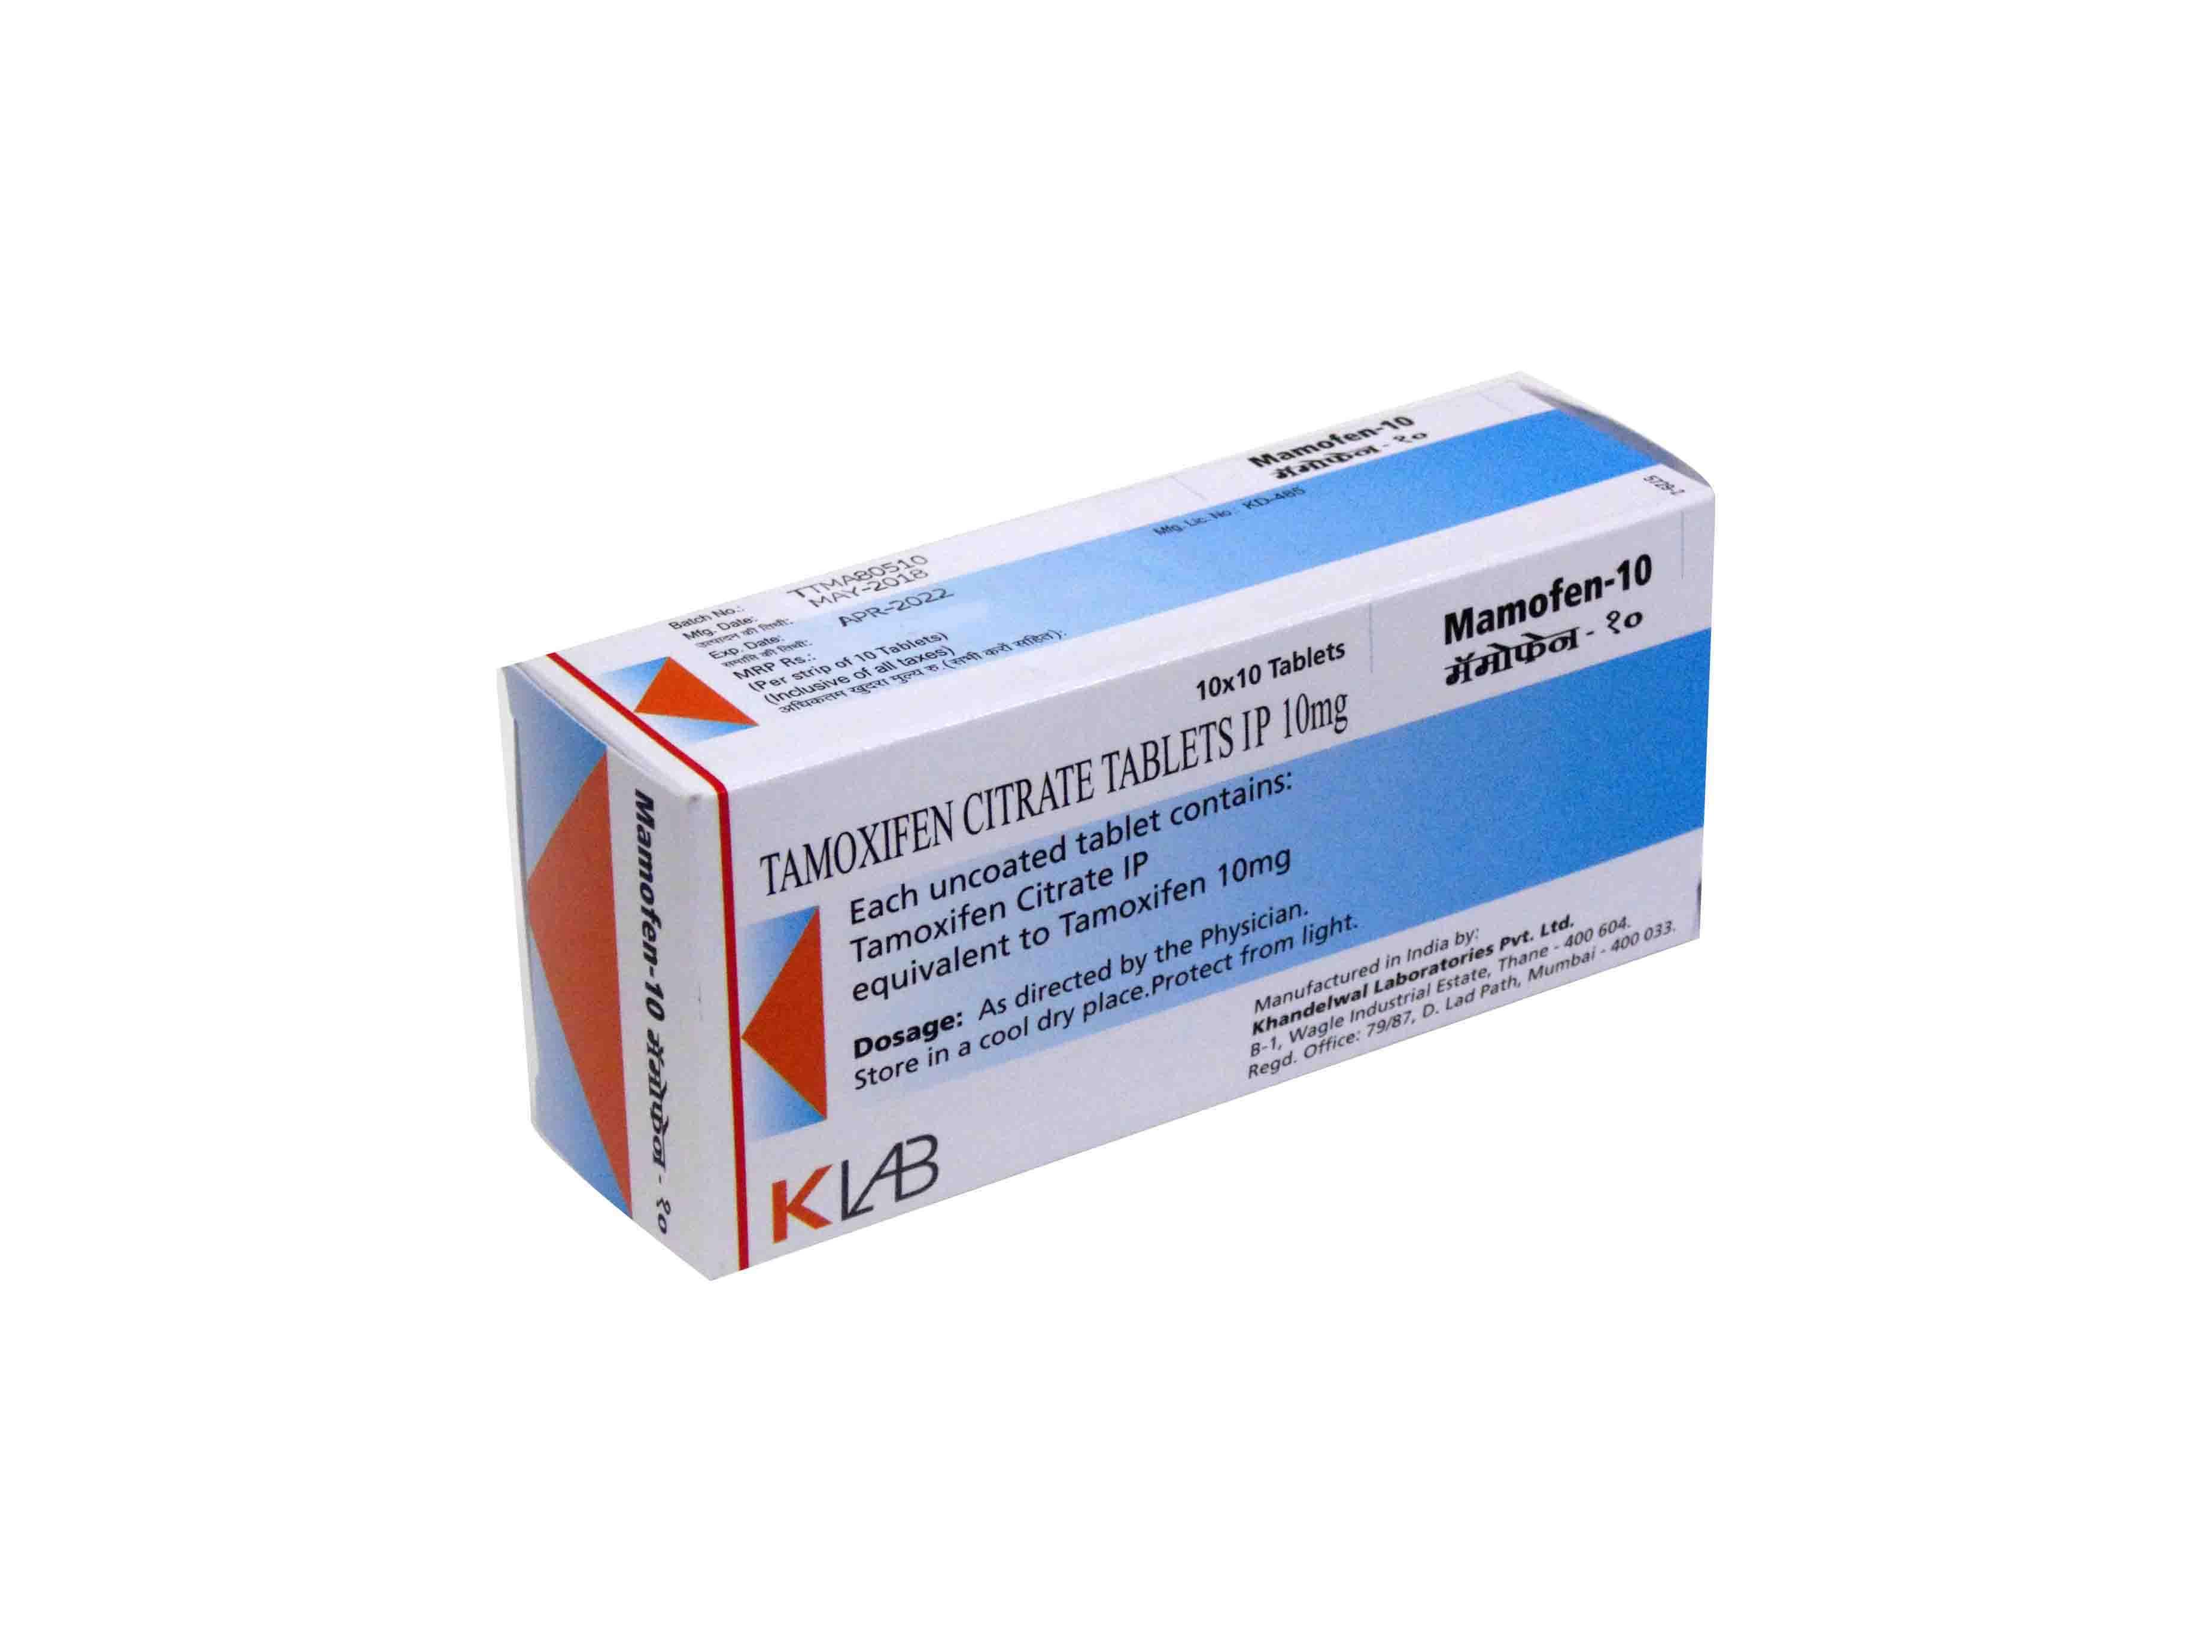 Mamofen 10 mg